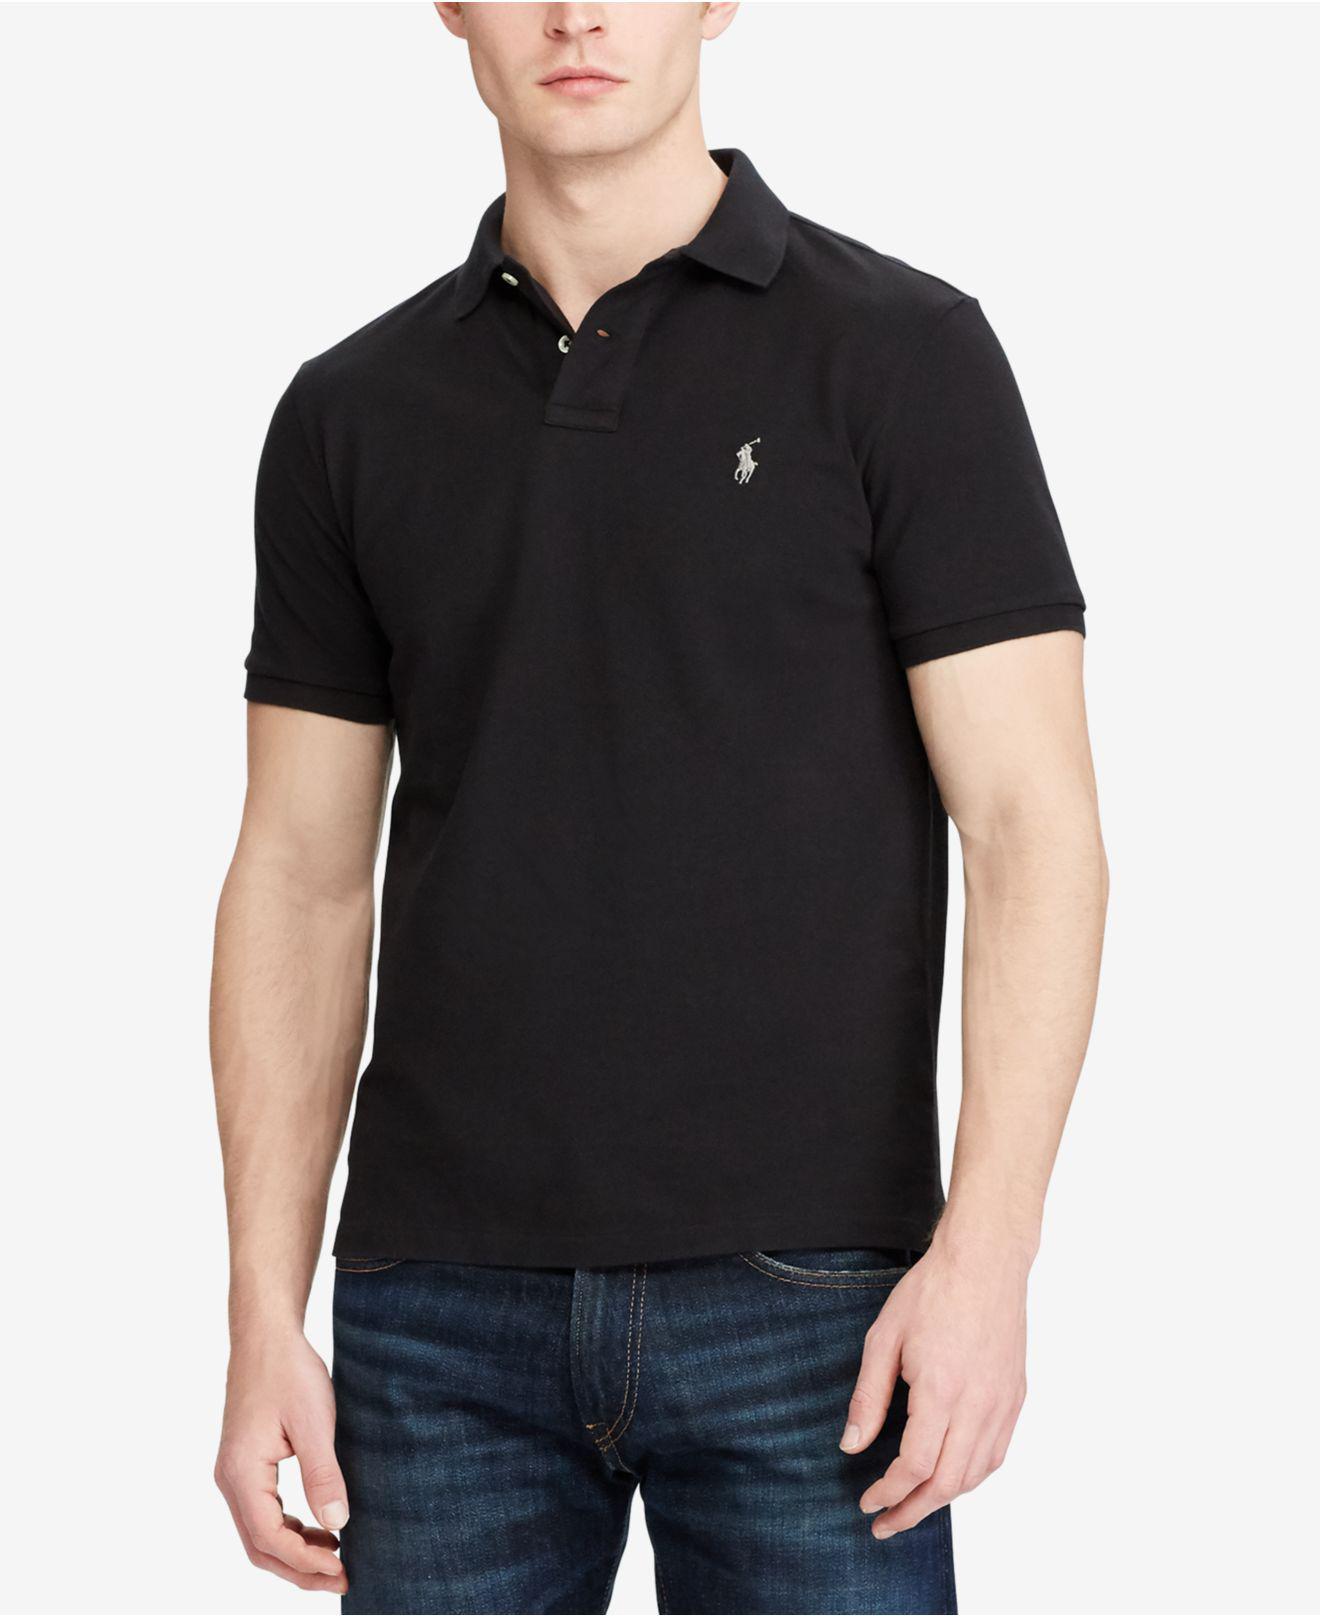 bddd3adca84 Lyst - Polo Ralph Lauren Cotton Mesh Custom Slim Fit Polo Shirt in ...